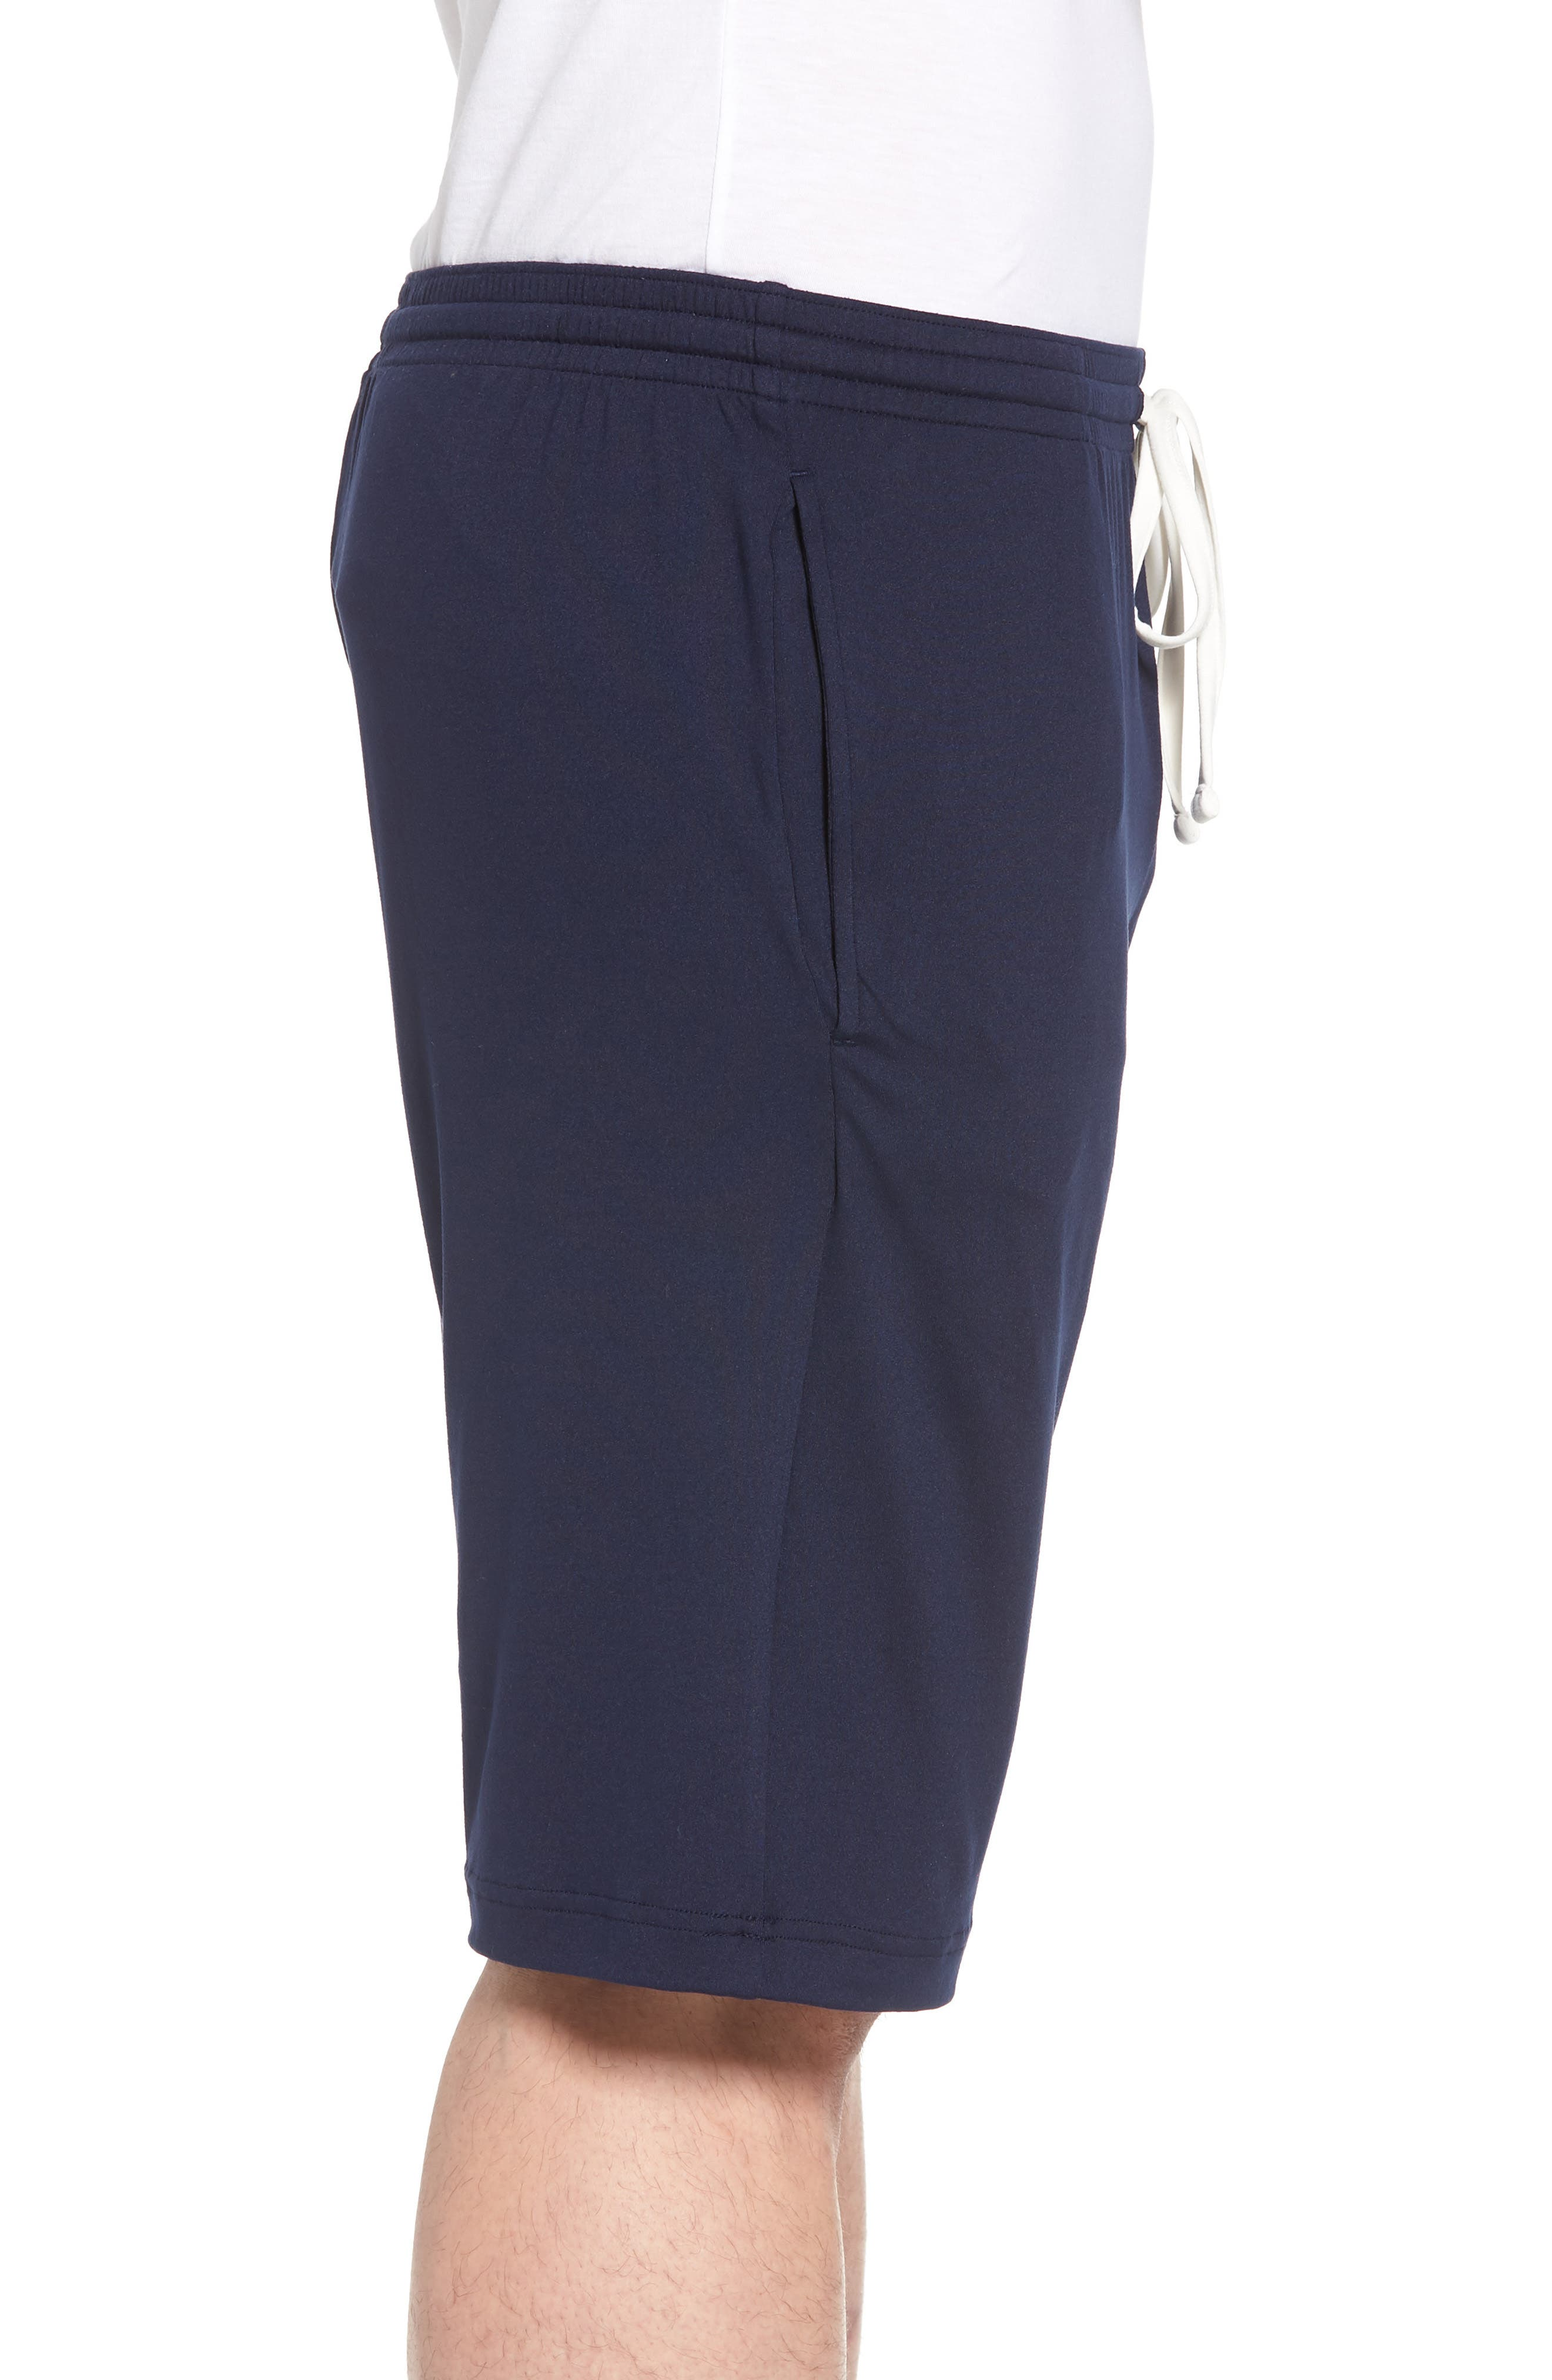 Alternate Image 3  - Polo Ralph Lauren Therma Lounge Shorts